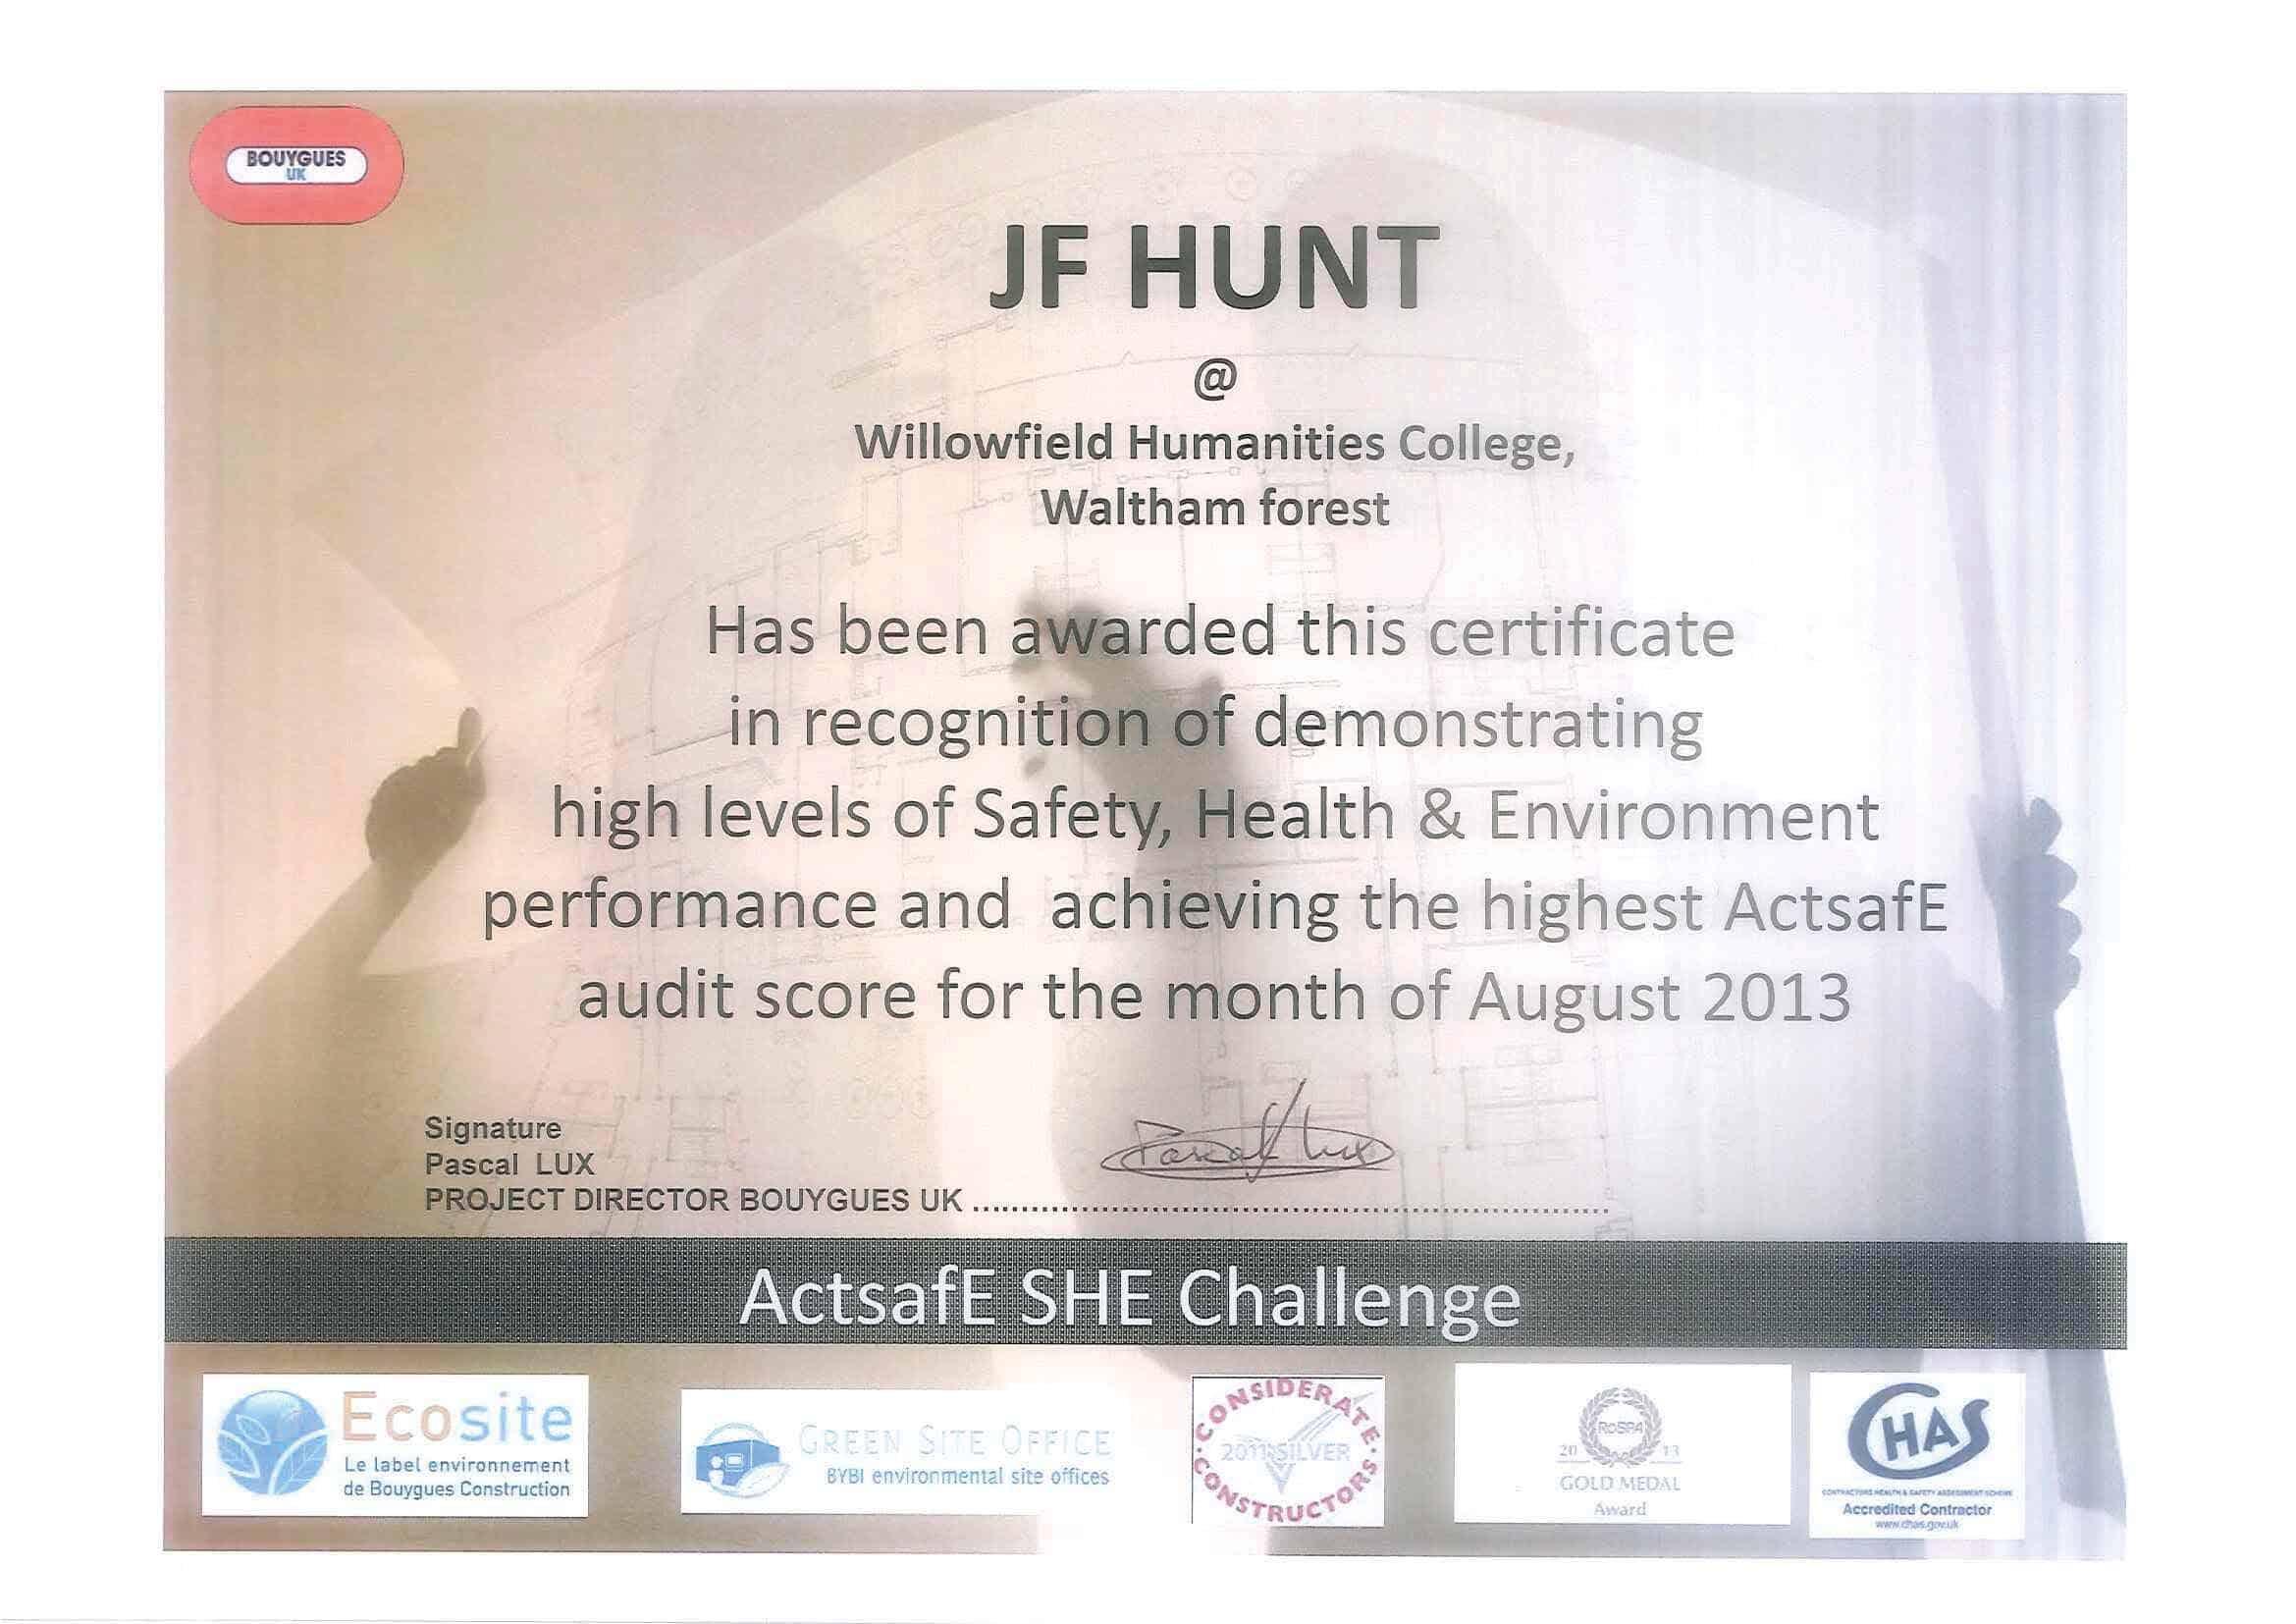 John F Hunt WHC Award